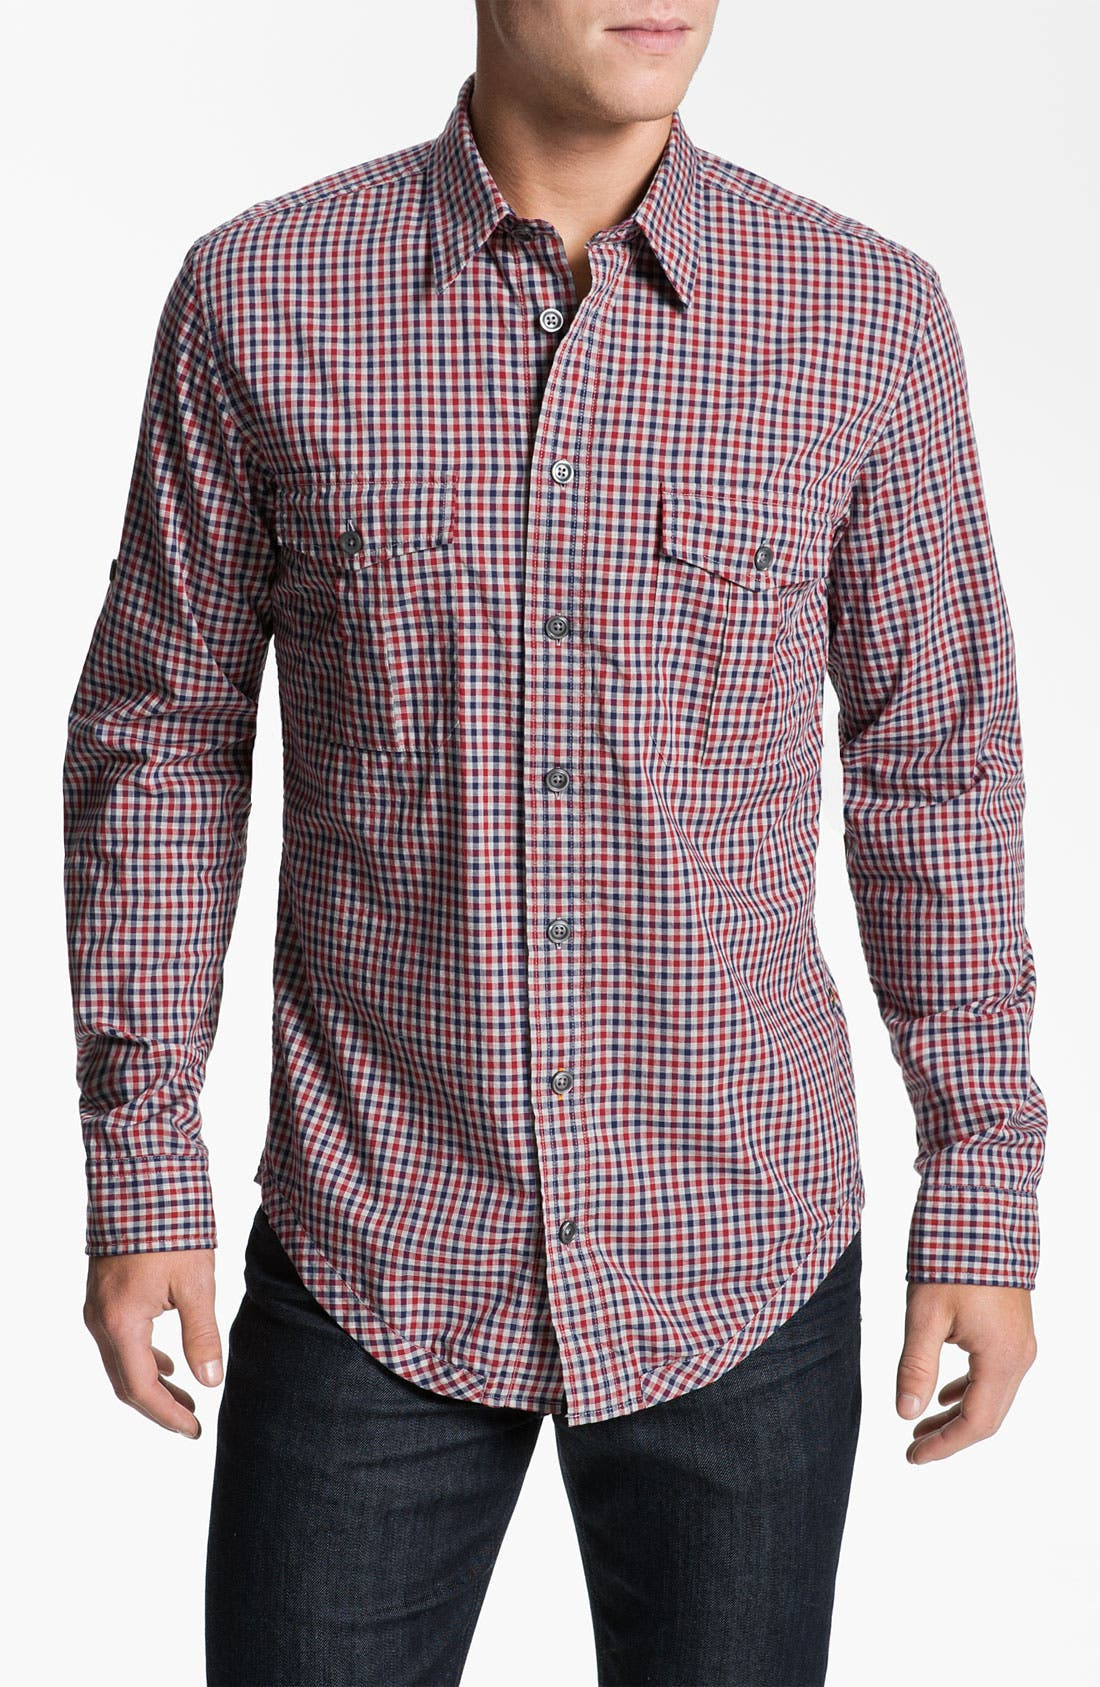 Alternate Image 1 Selected - BOSS Orange 'Ezzeronee' Check Woven Shirt